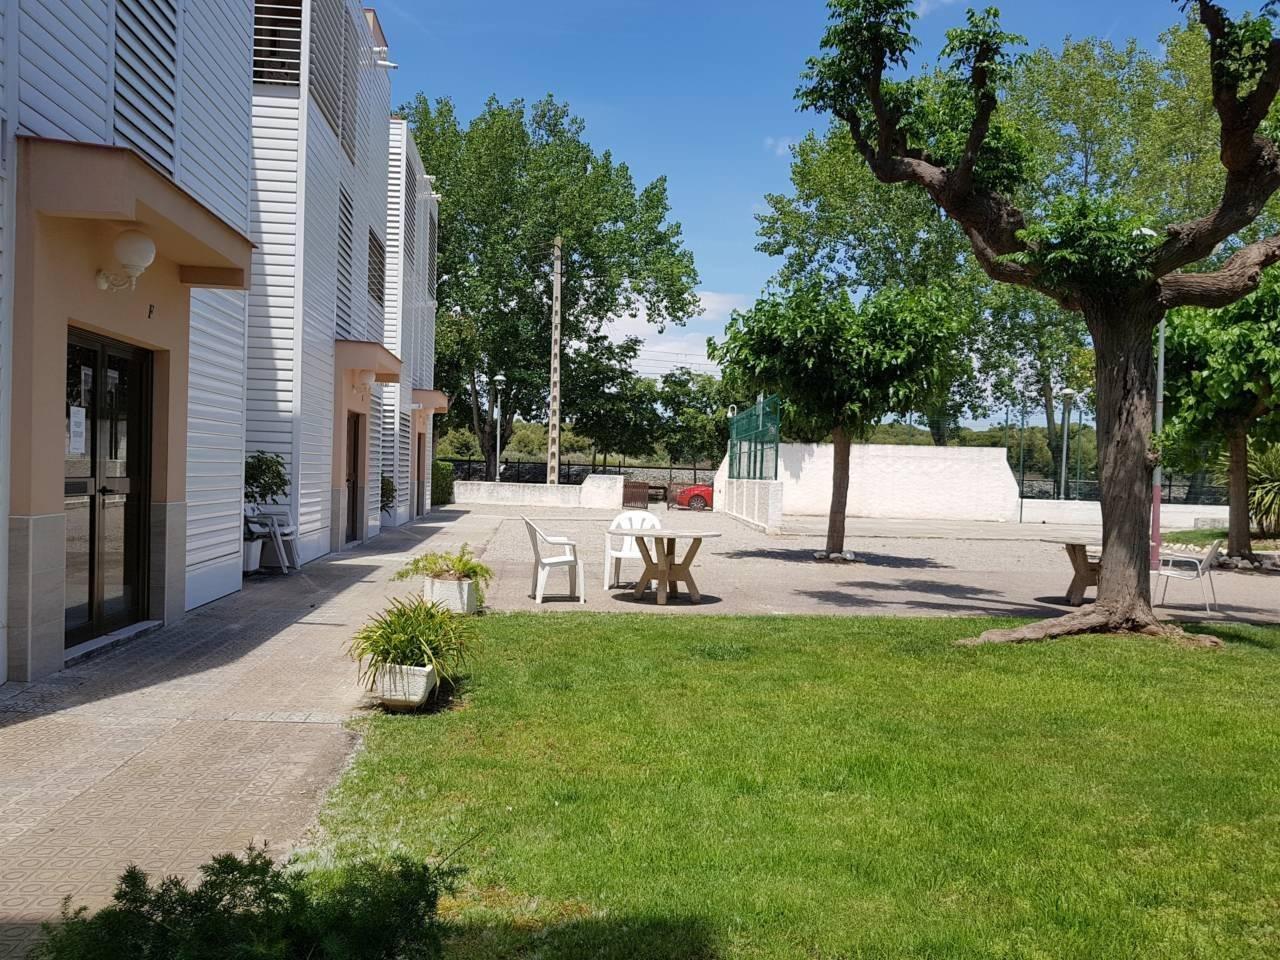 Piso / Barcelona / Vilanova i la Geltrú / L'Aragai-Prat de Vilanova